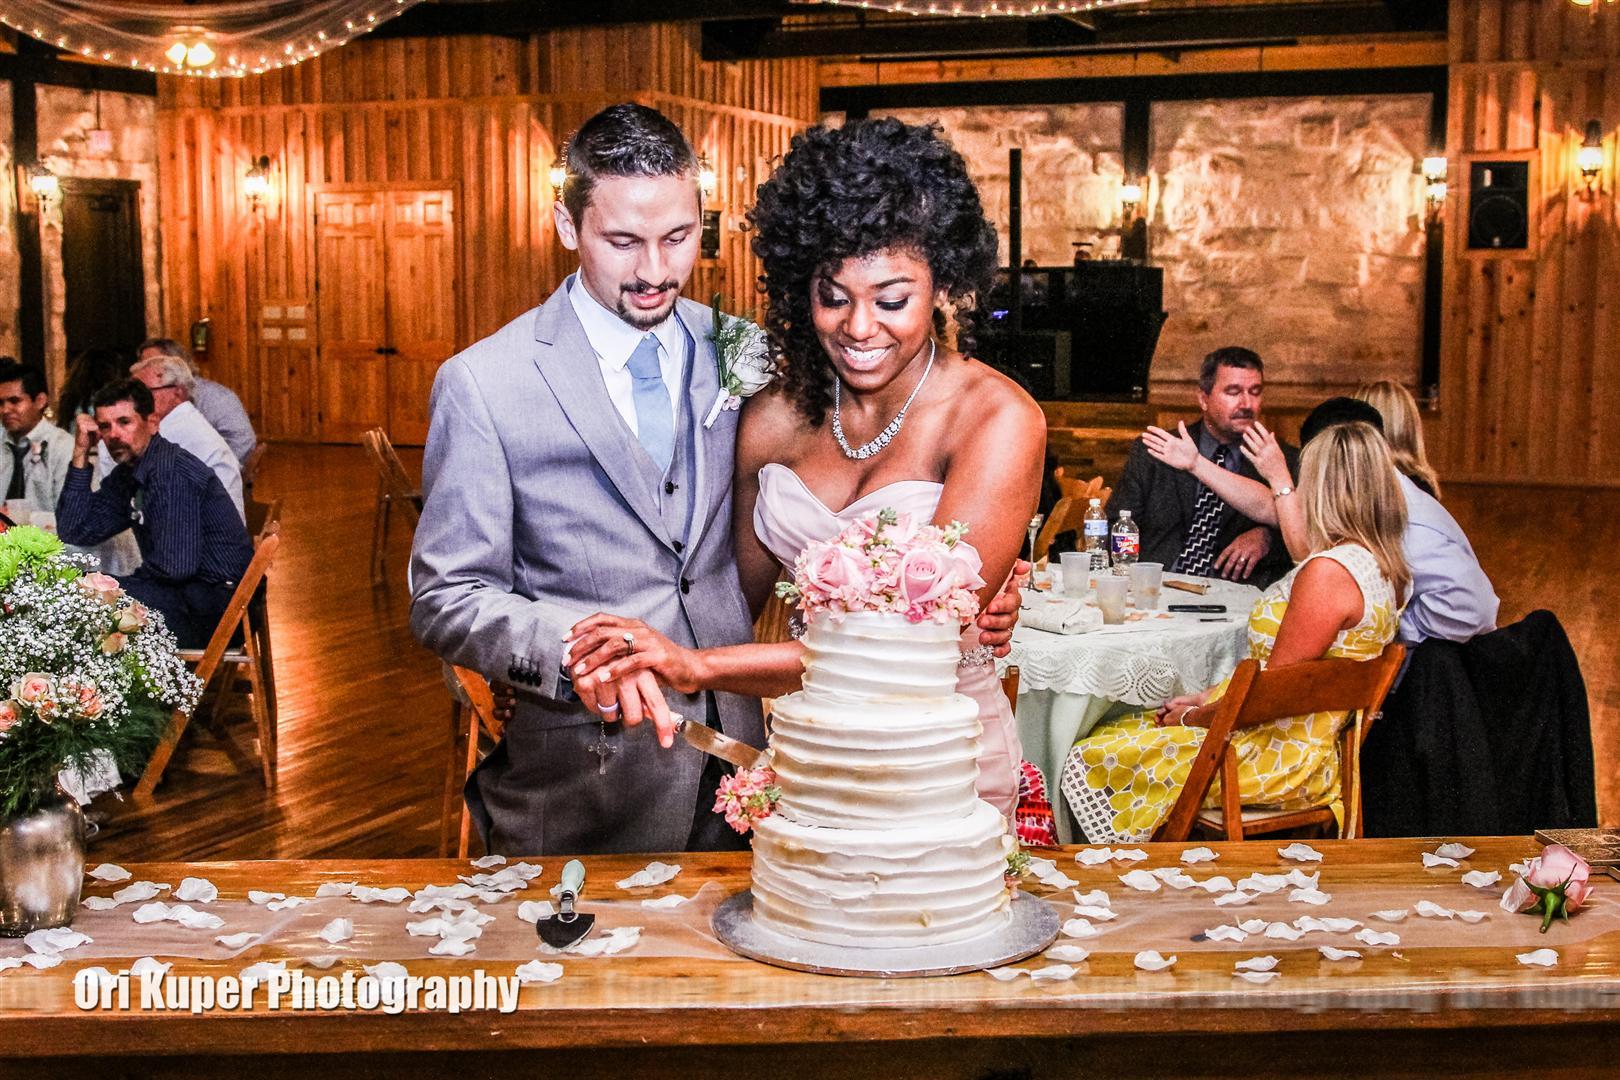 Ori Kuper Photography Weddings Josh Aubrey IMG_4731.jpg